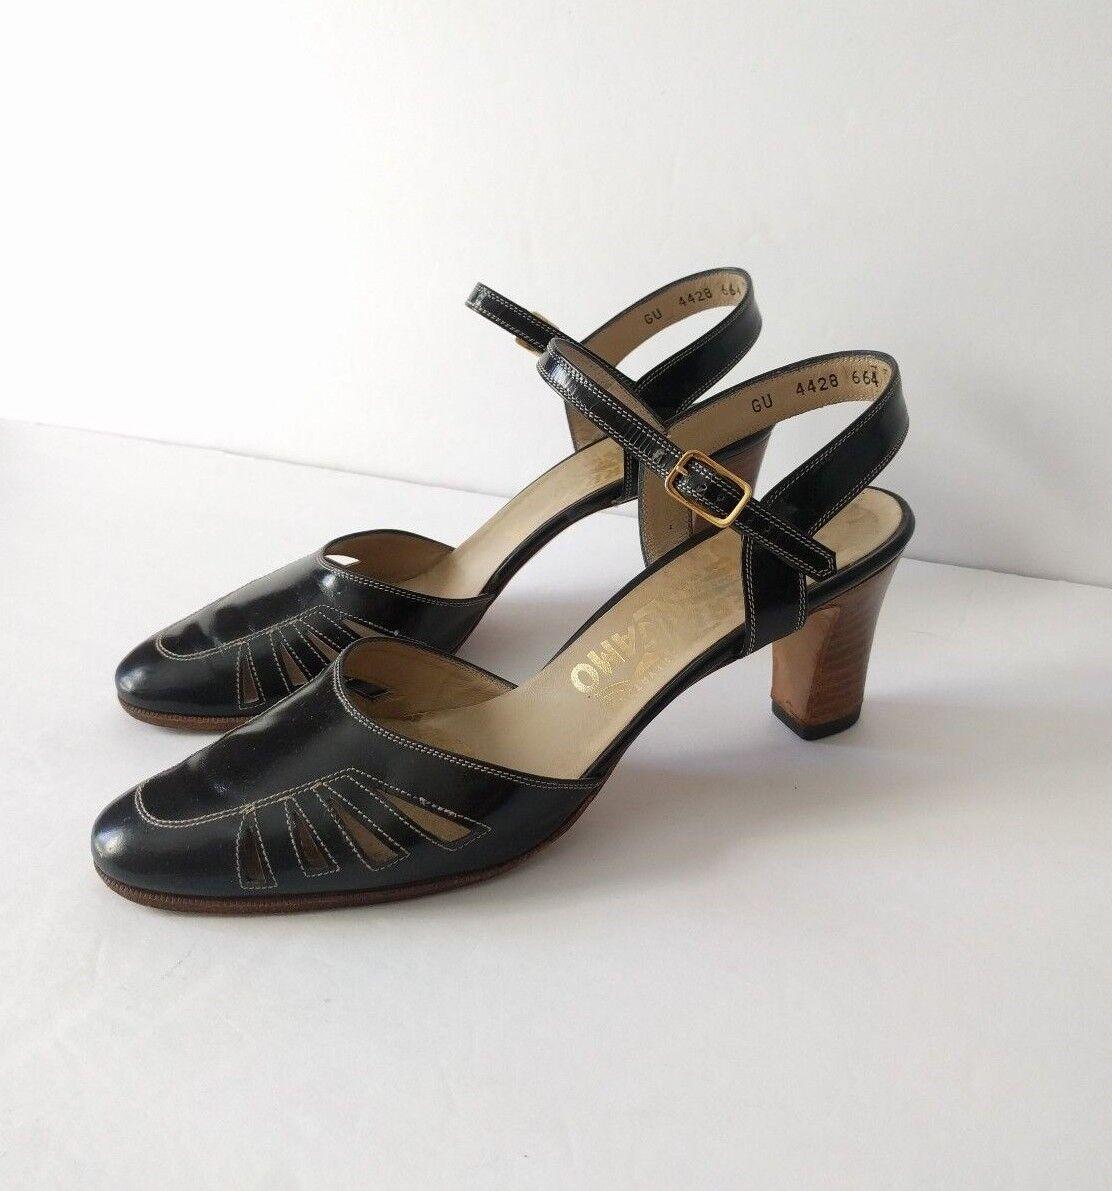 "Salvatore Ferragamo Women's 7 Black Leather Ankle Strap Heels Side Cut Out 2.5"""